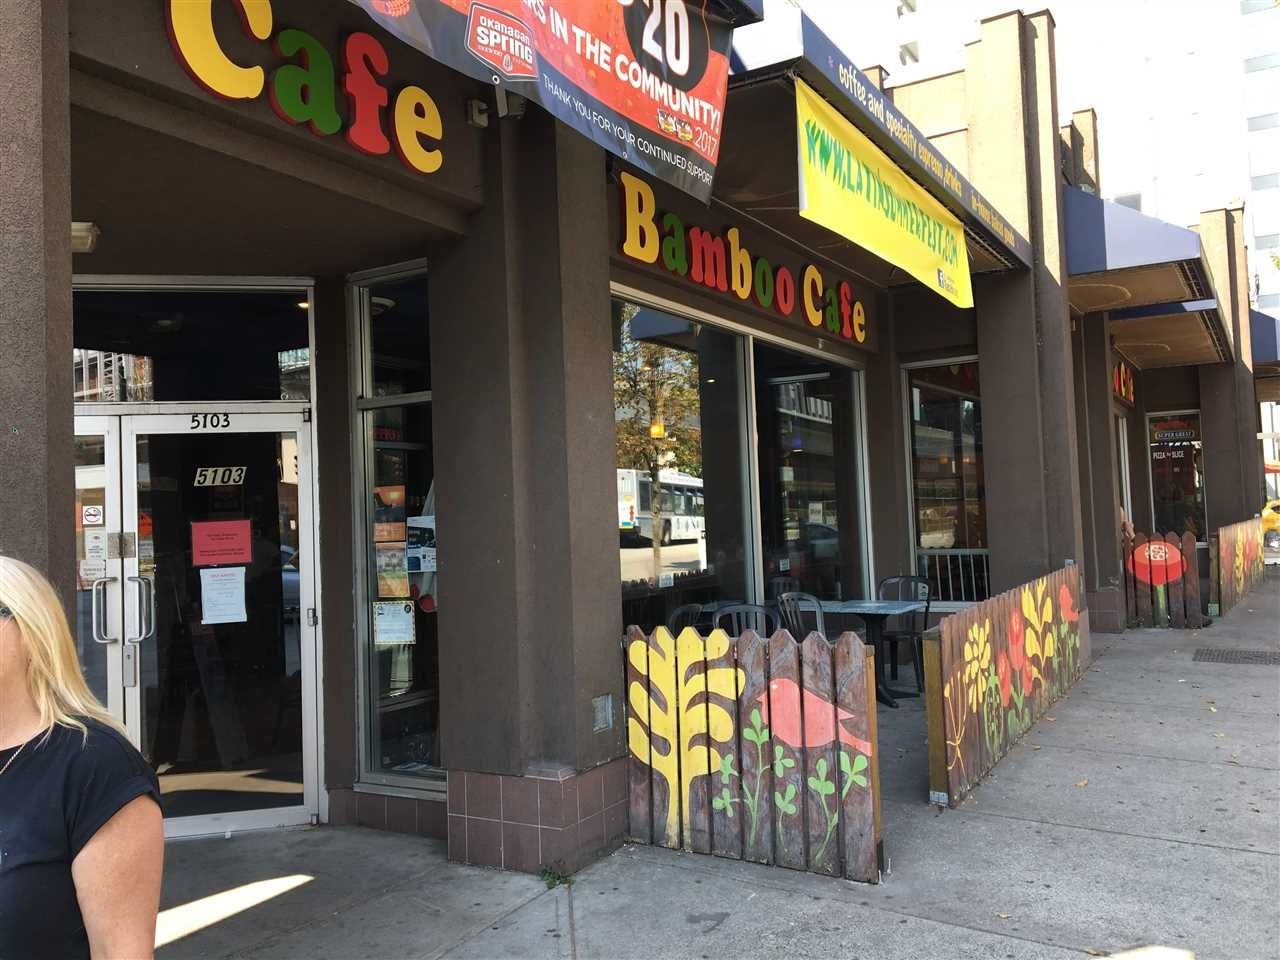 Main Photo: 5103 JOYCE STREET: Home for sale (Vancouver East)  : MLS®# C8014383